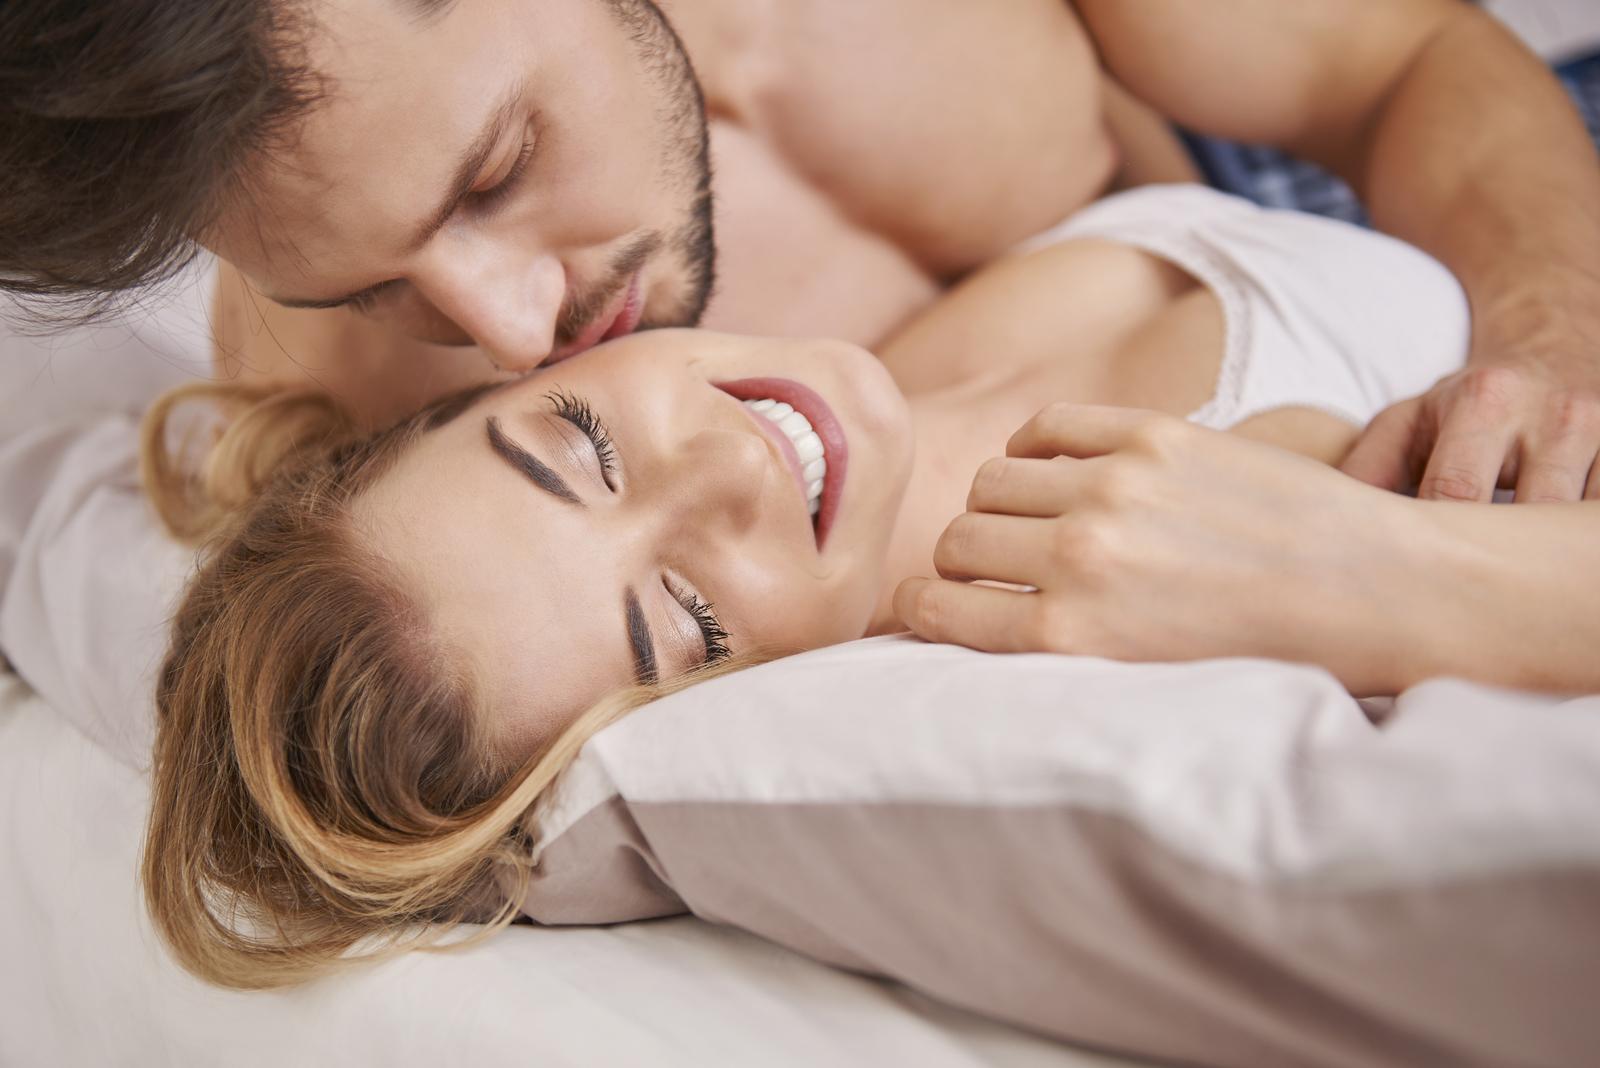 a man kisses a woman on the cheek